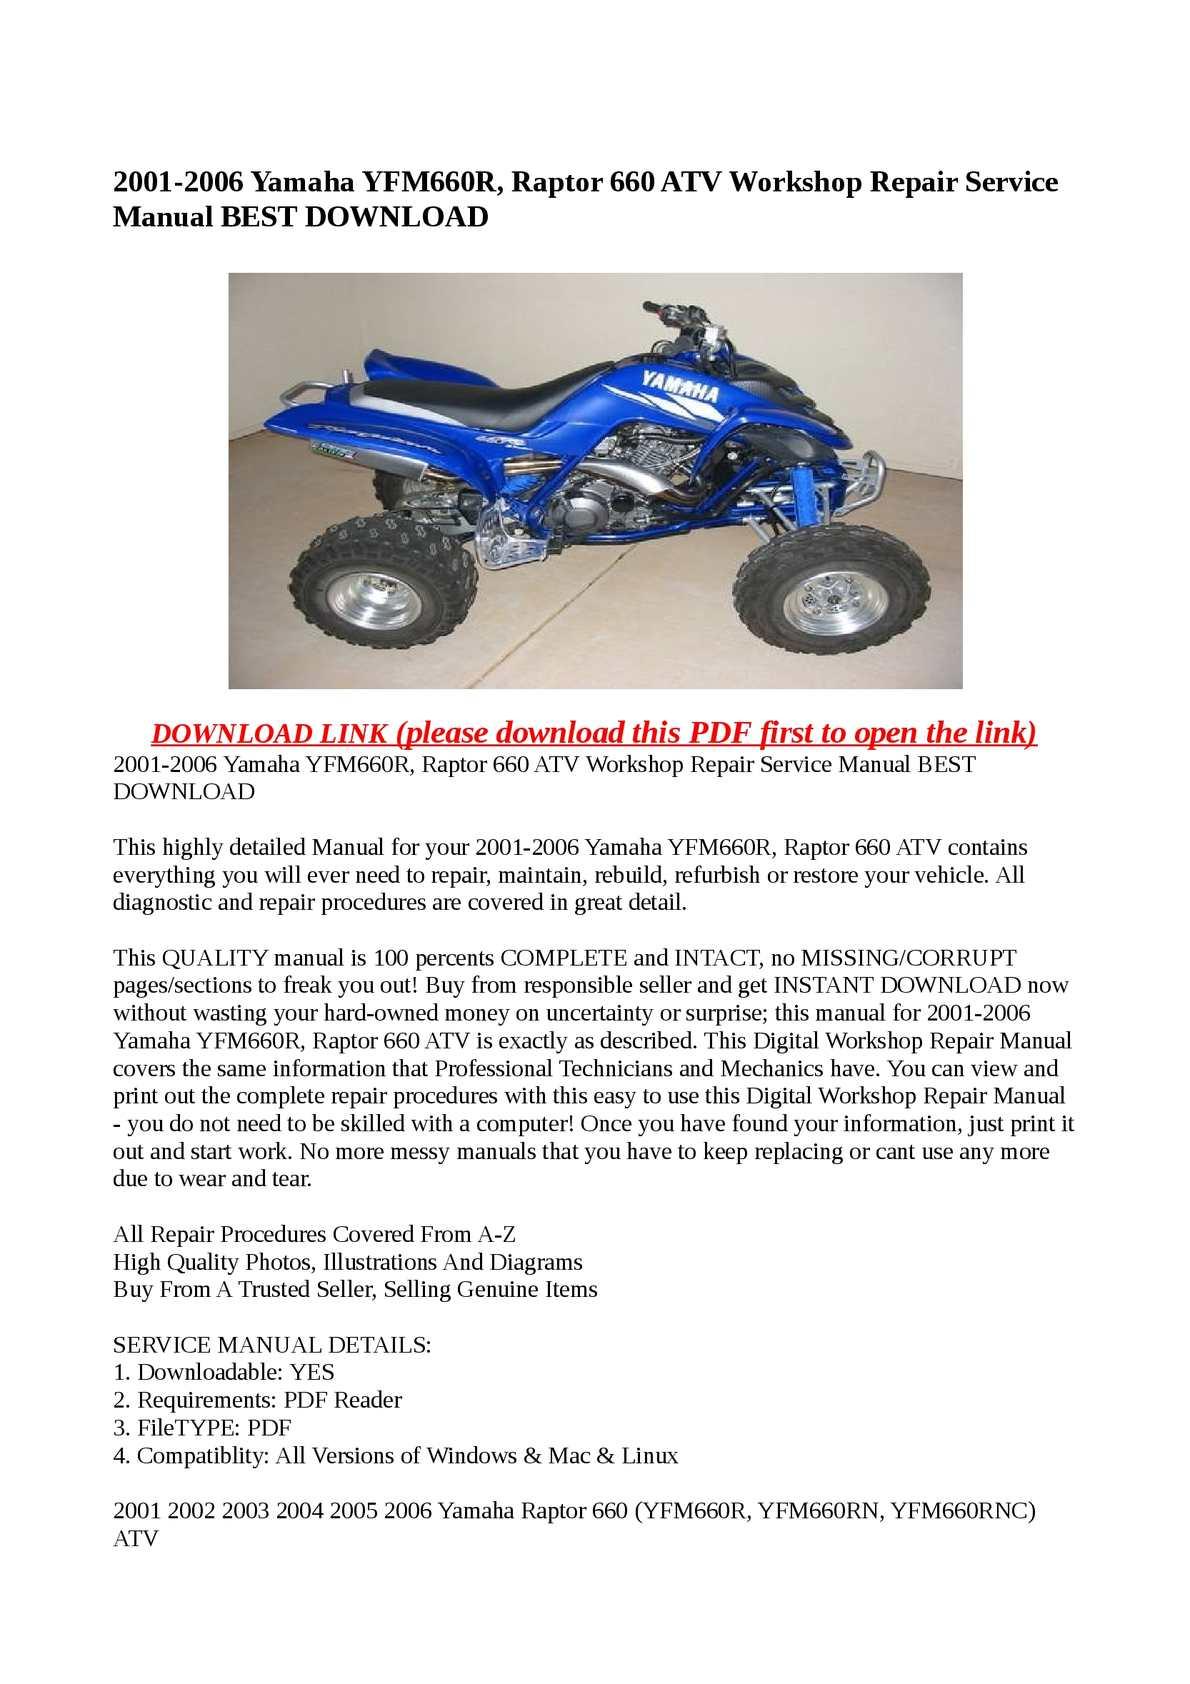 hight resolution of 2001 2006 yamaha yfm660r raptor 660 atv workshop repair service manual best download